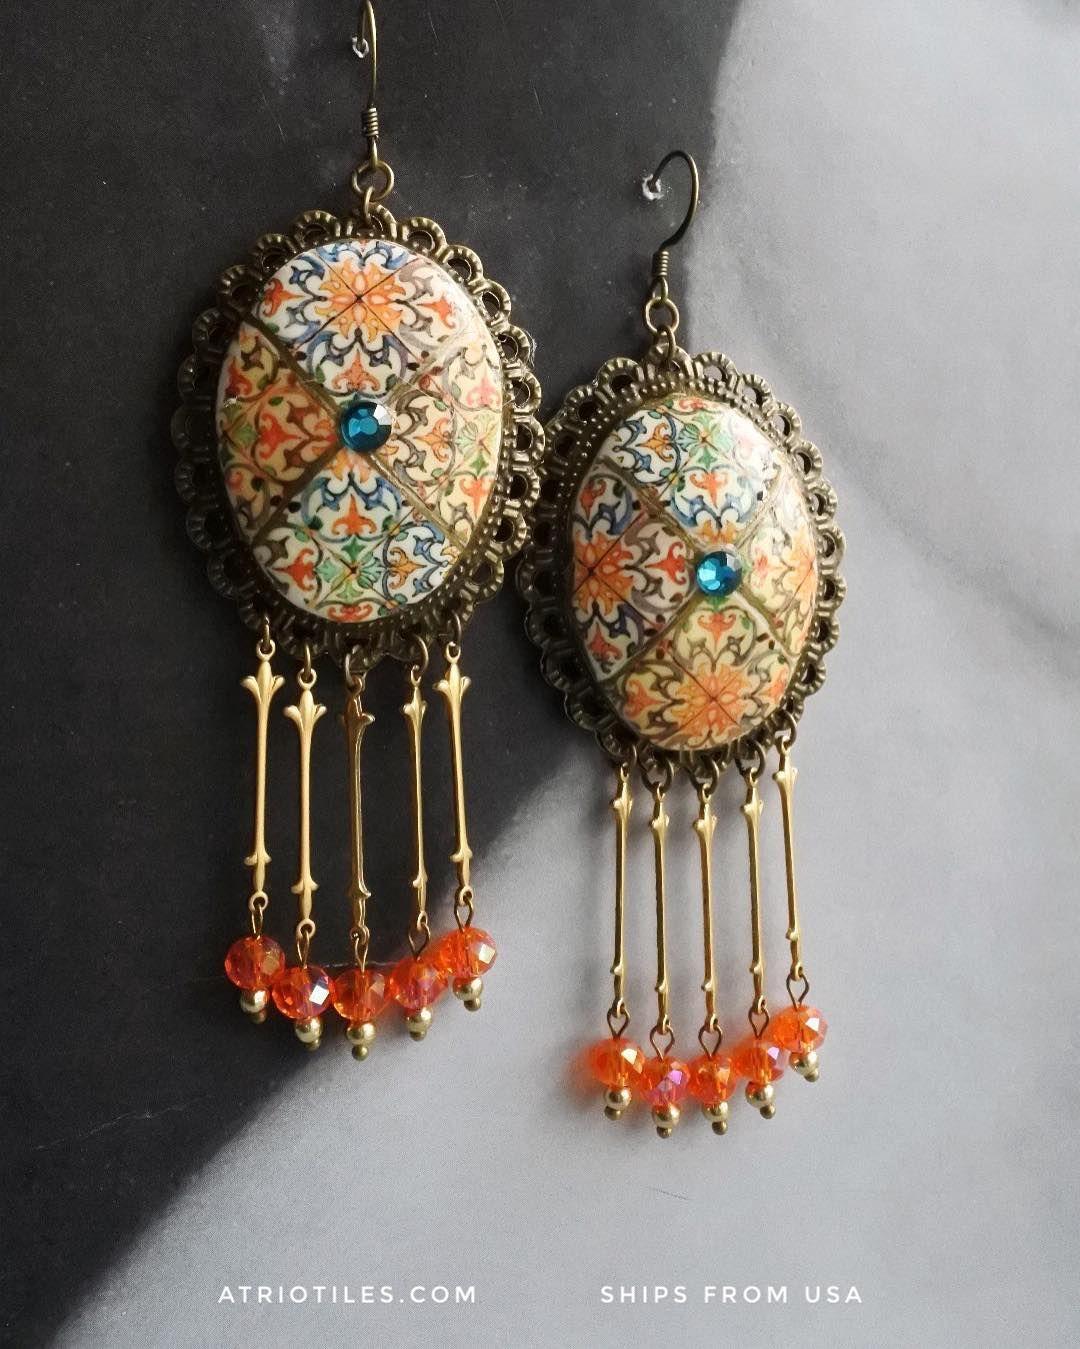 Chandelier earrings with Sicily ceramic tiles